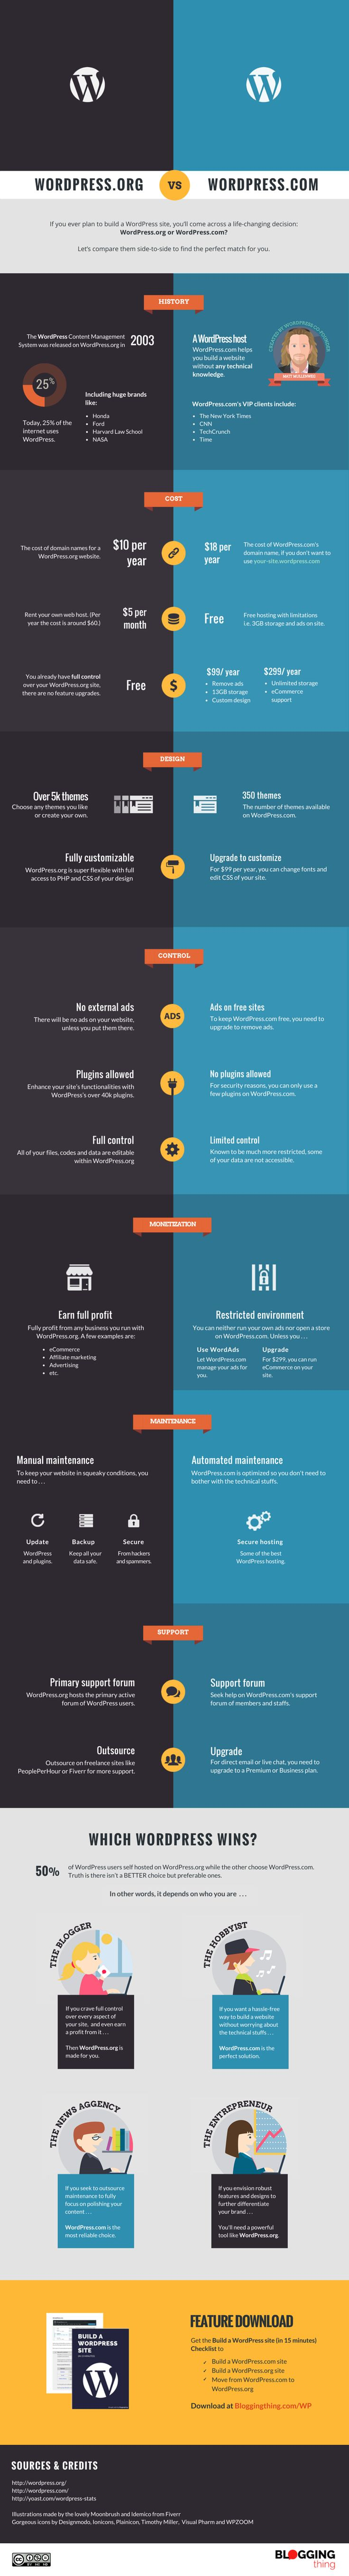 WordPress-dot-org-vs-WordPress-dot-com-Infographic-05